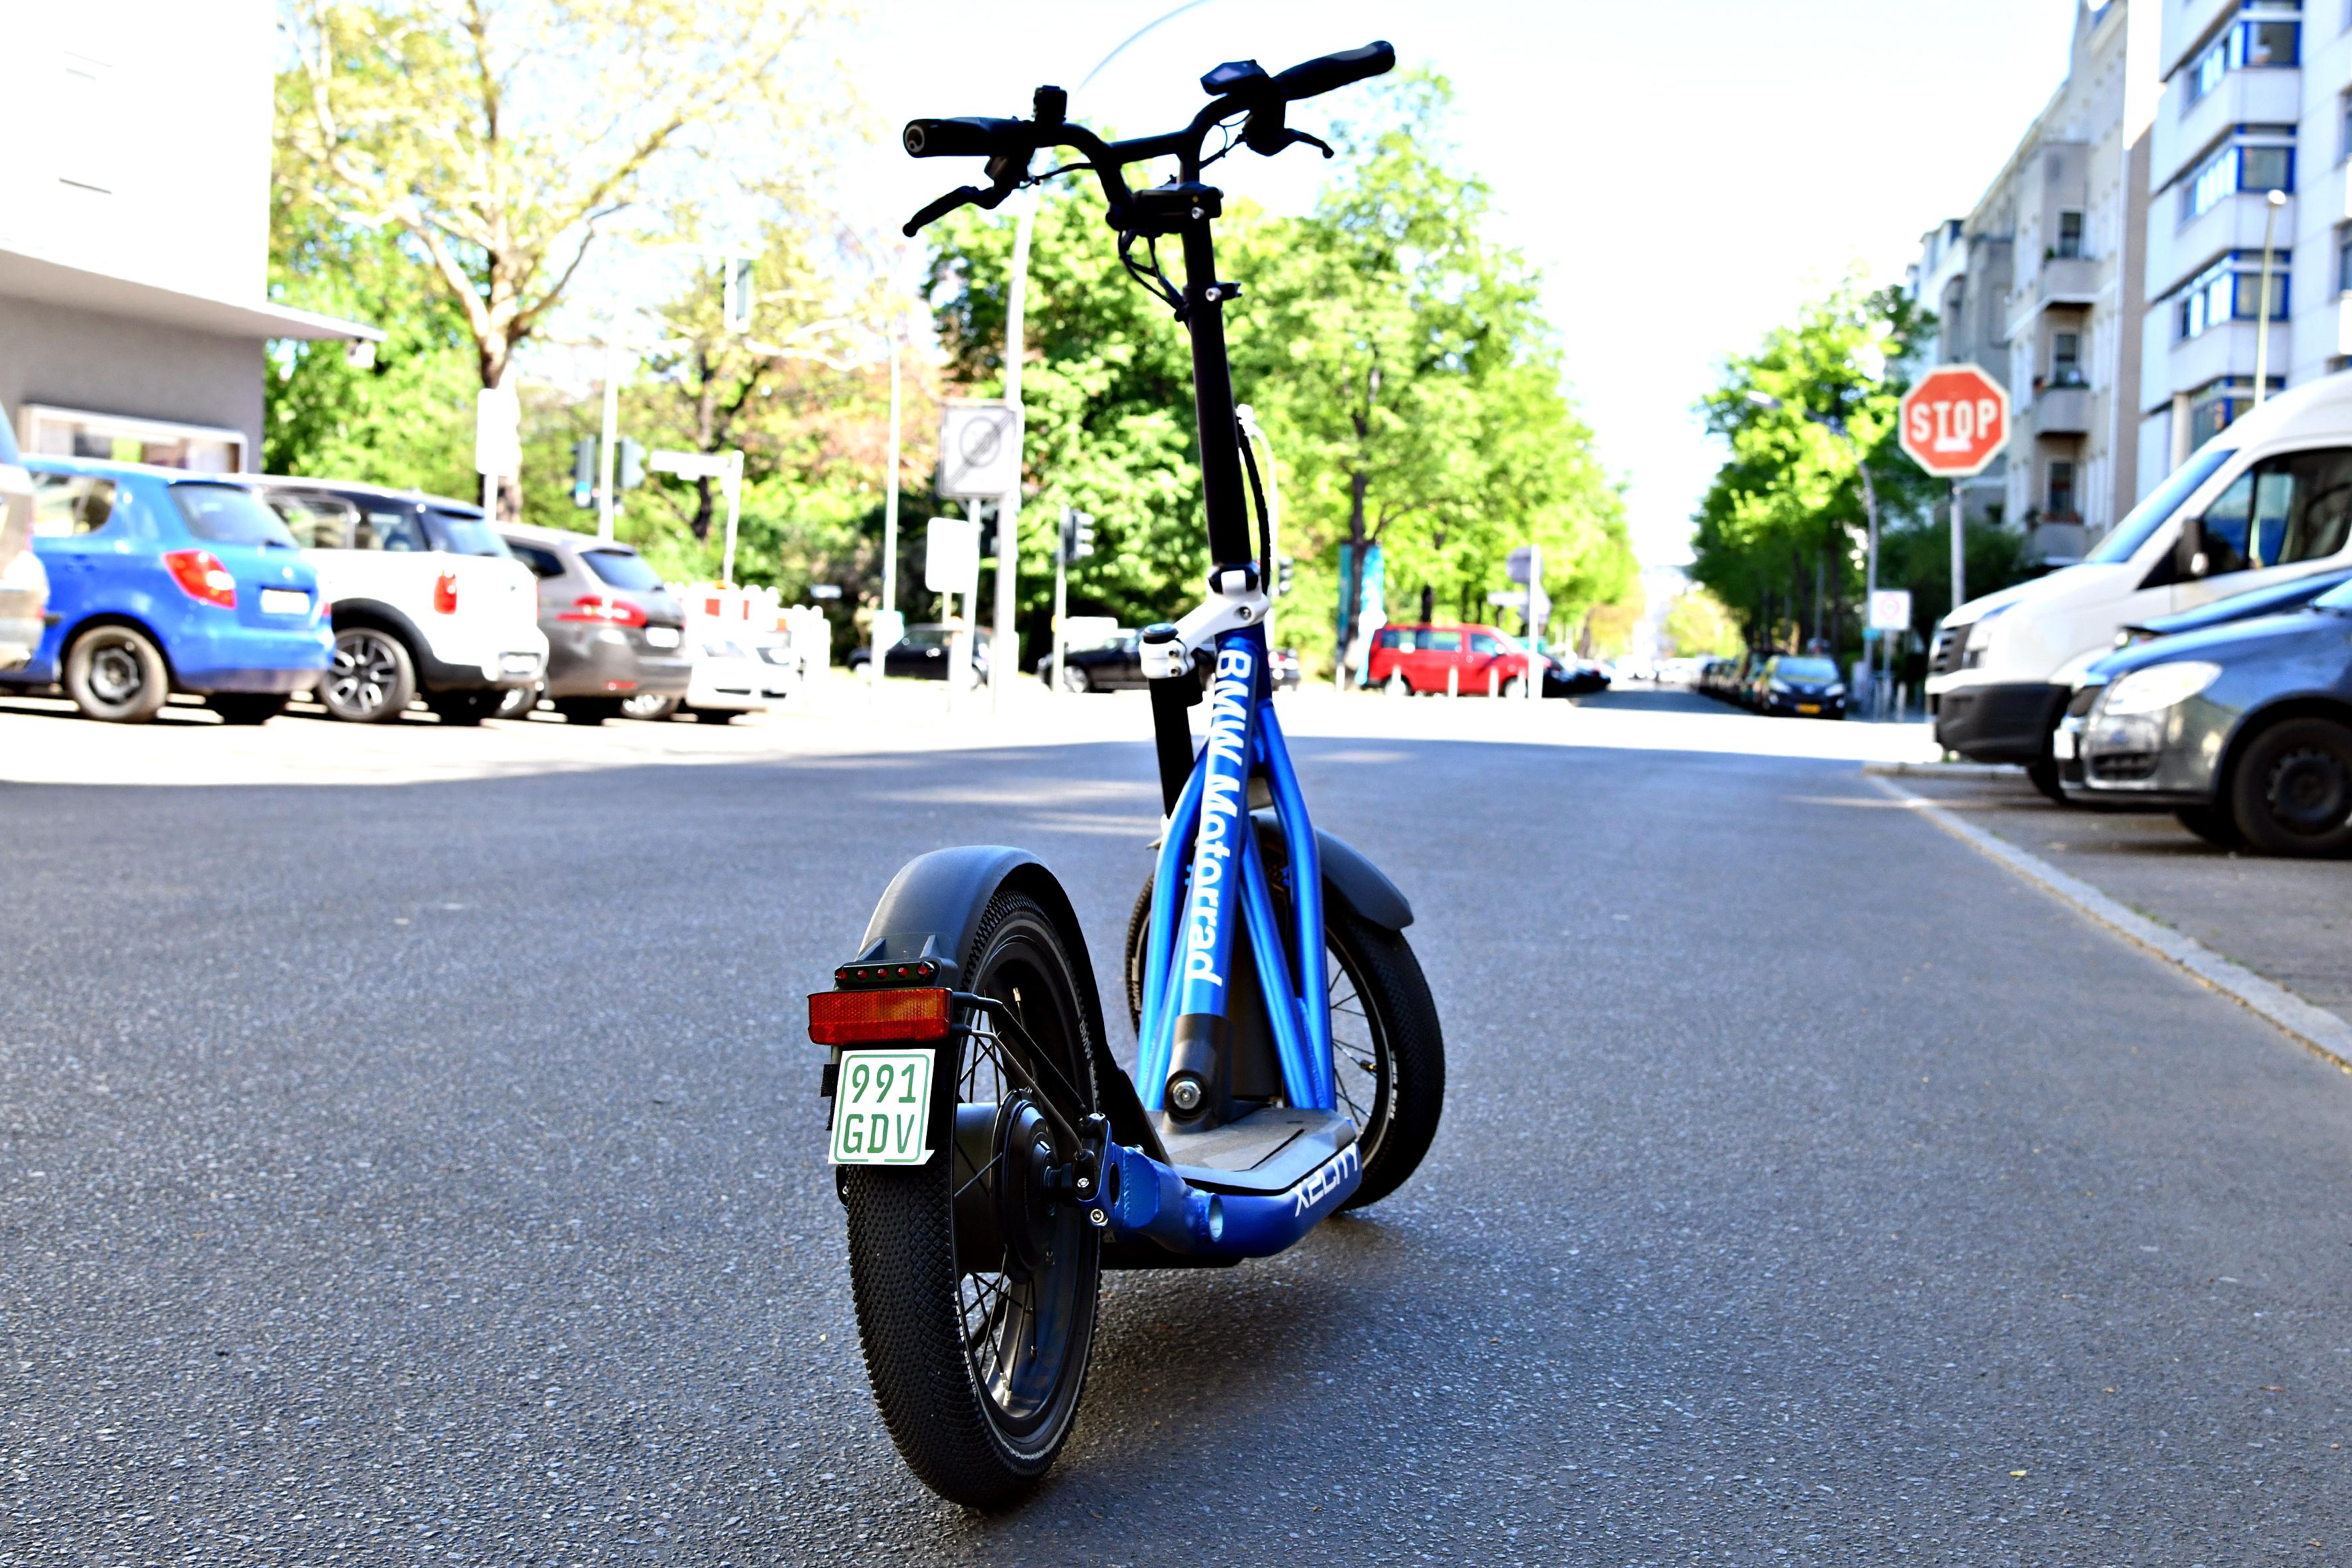 E-Scooter Plakette hinten